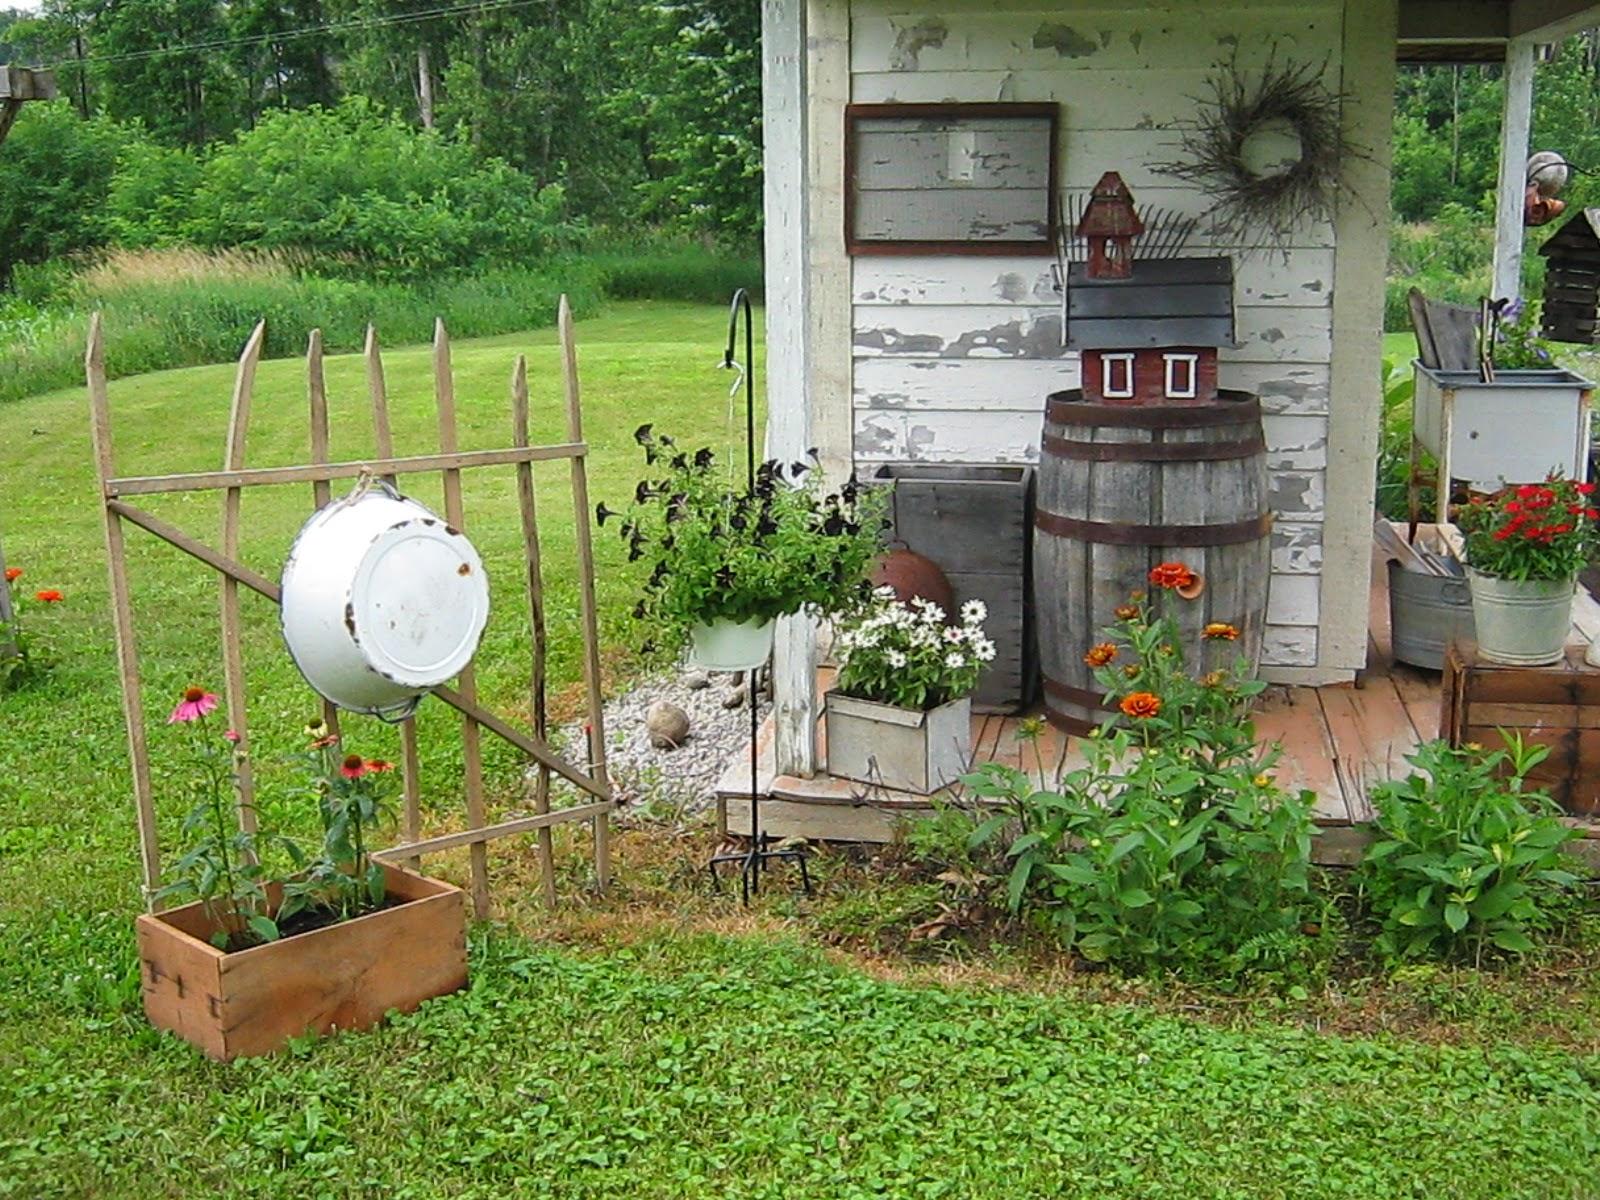 Primitive Passion Decorating: Garden shed expansion ...